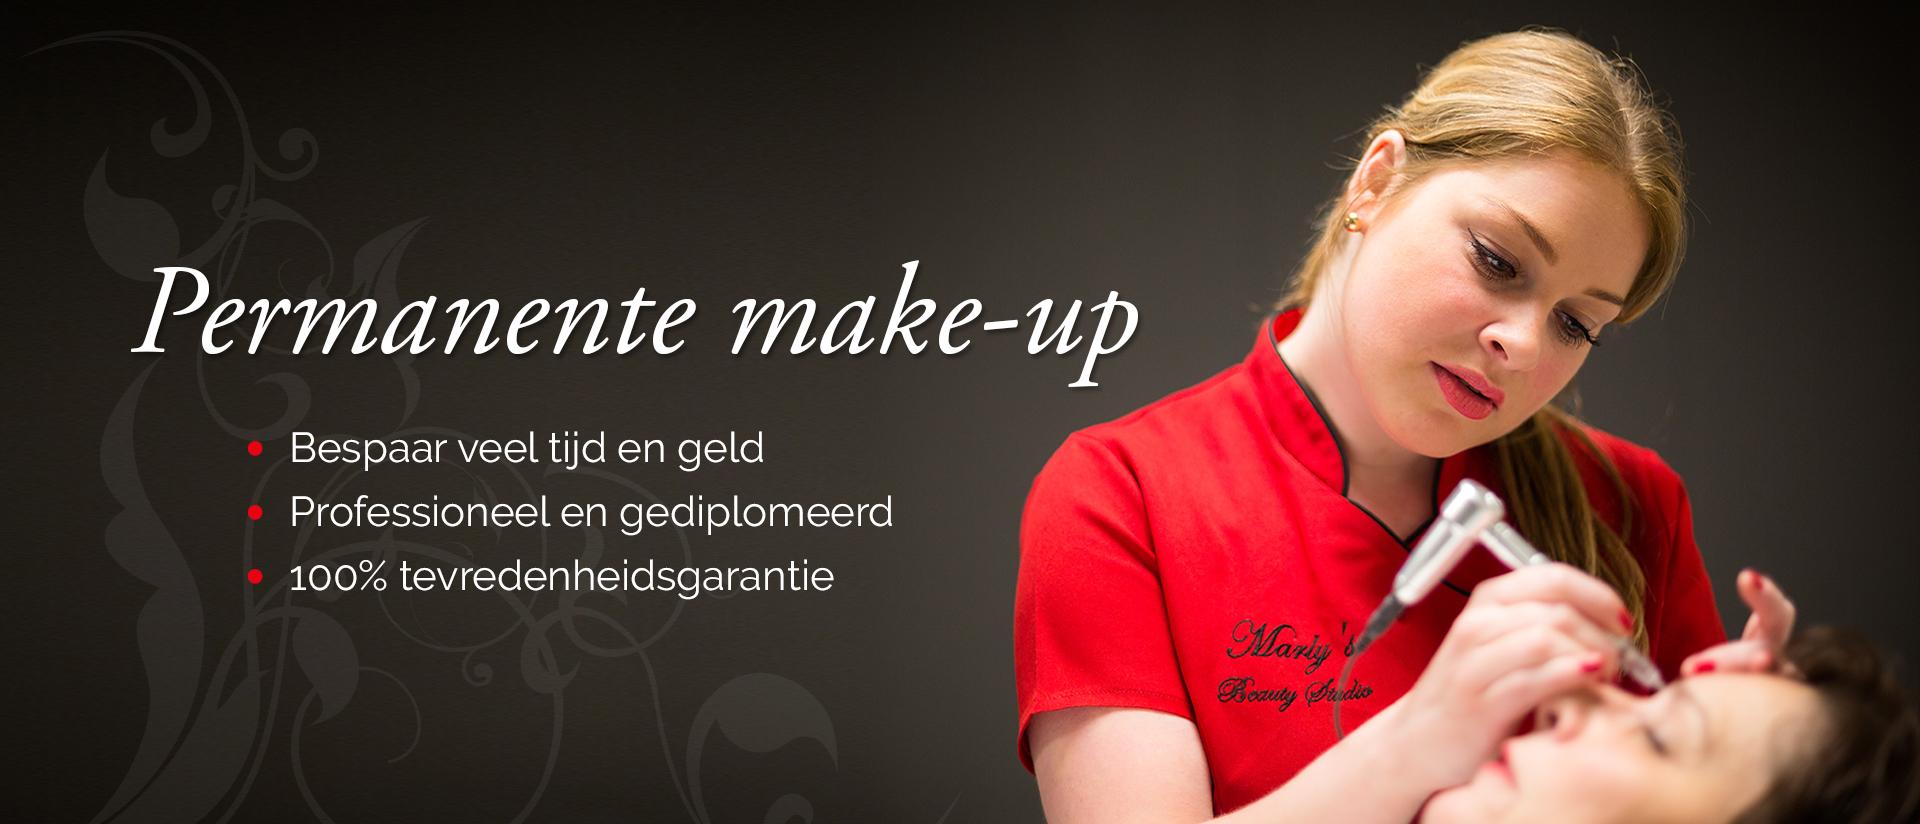 Permanente make-up Helmond